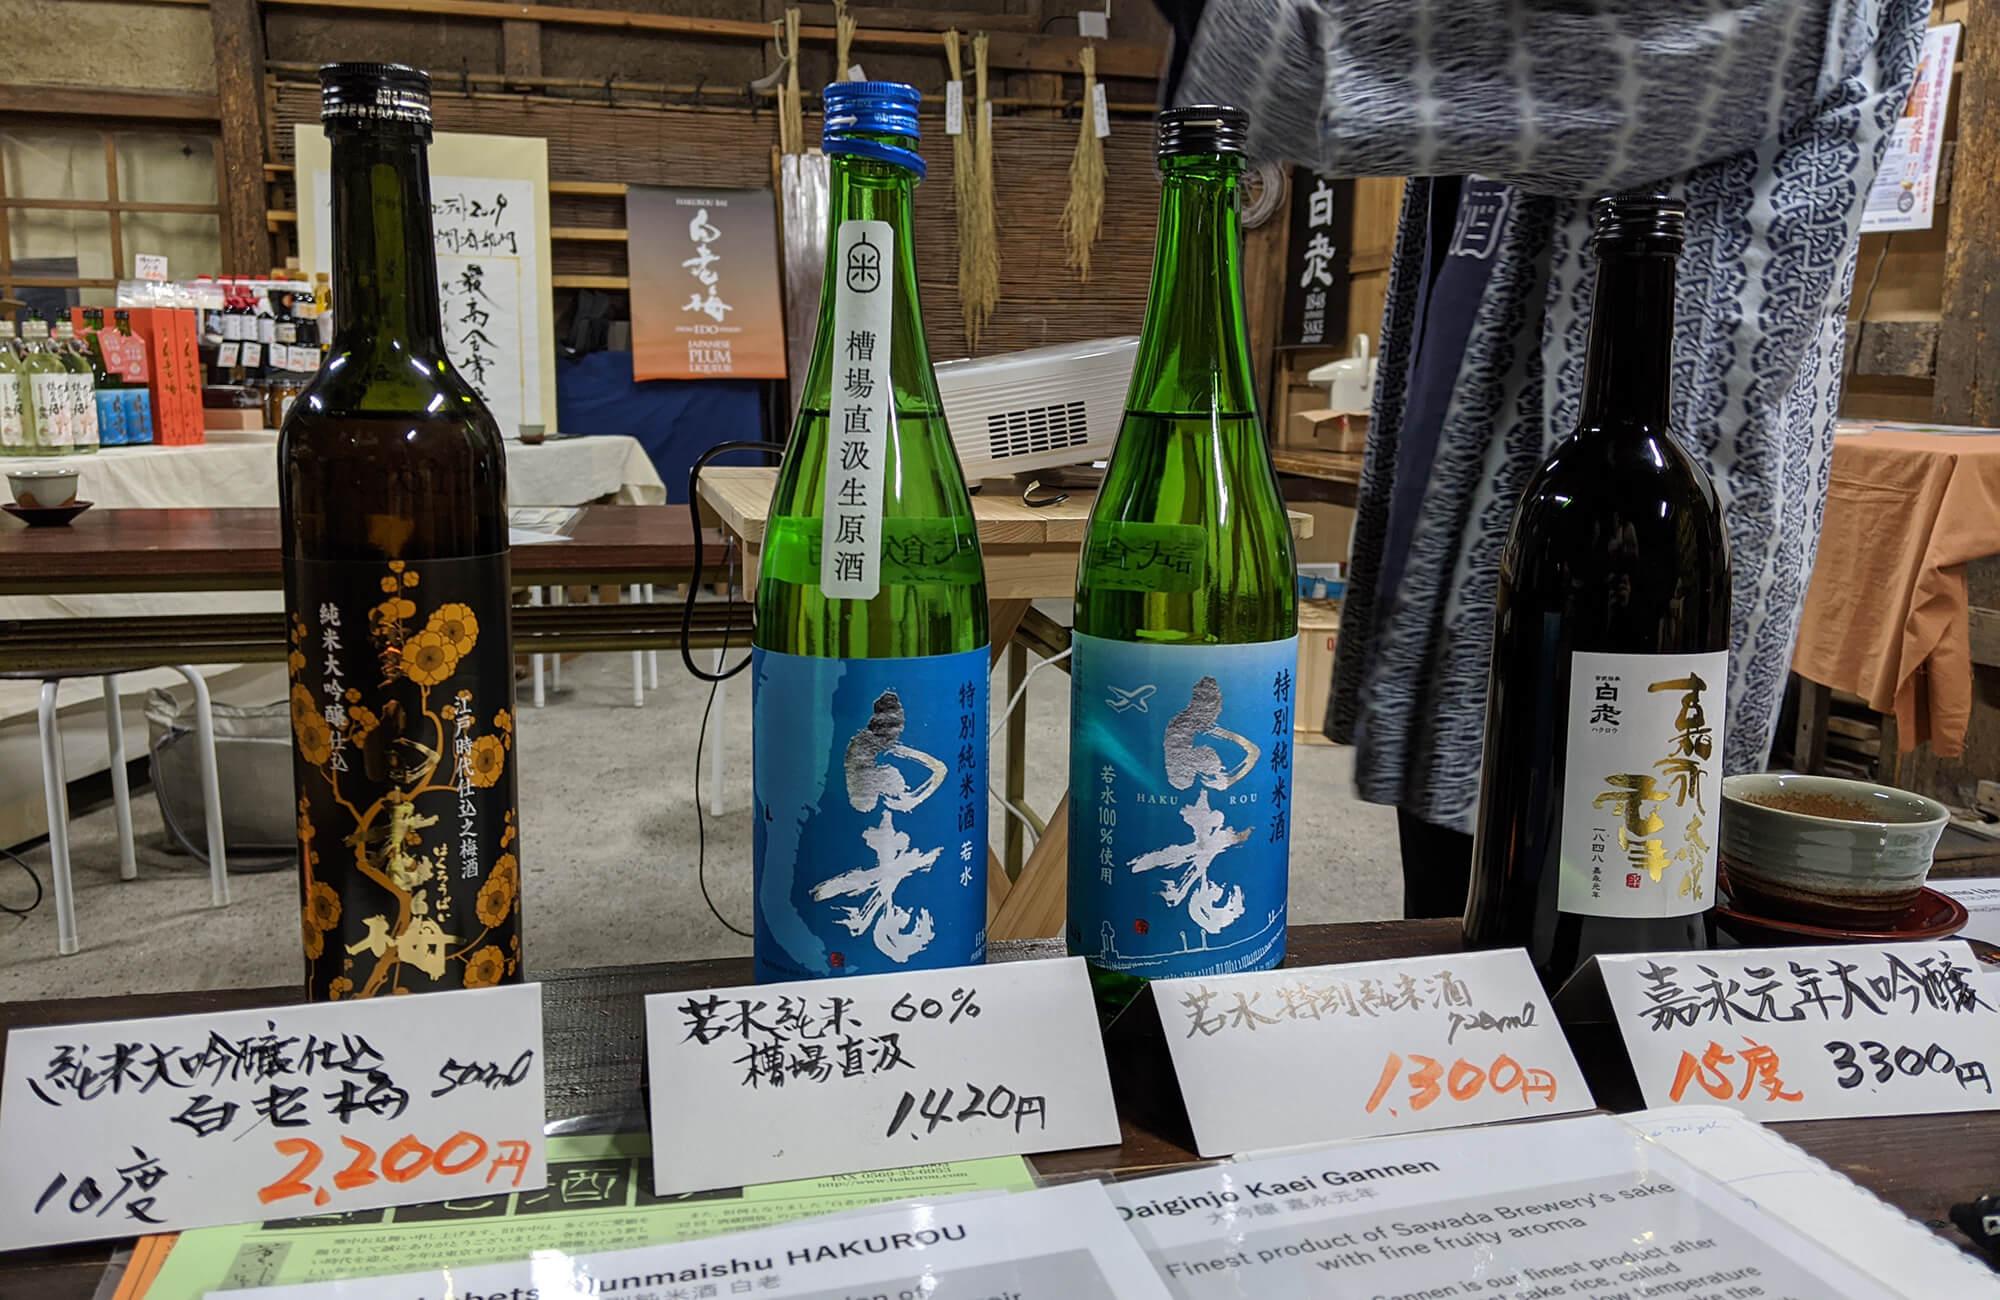 Sawada Shuzo Sake Brewery